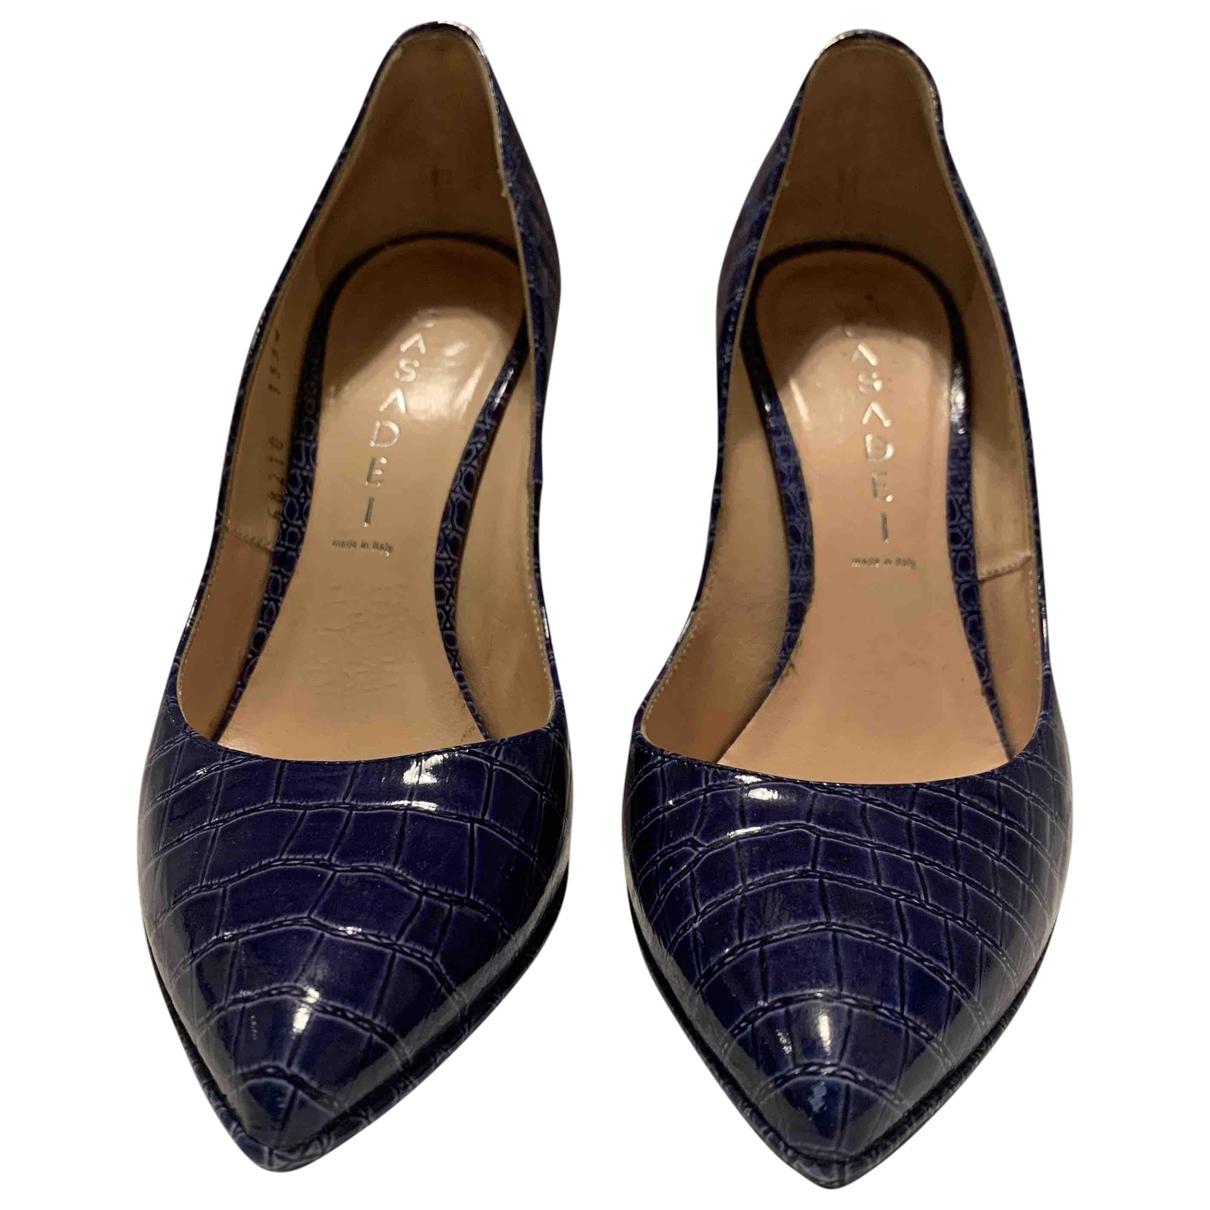 Casadei - Escarpins   pour femme en crocodile - bleu